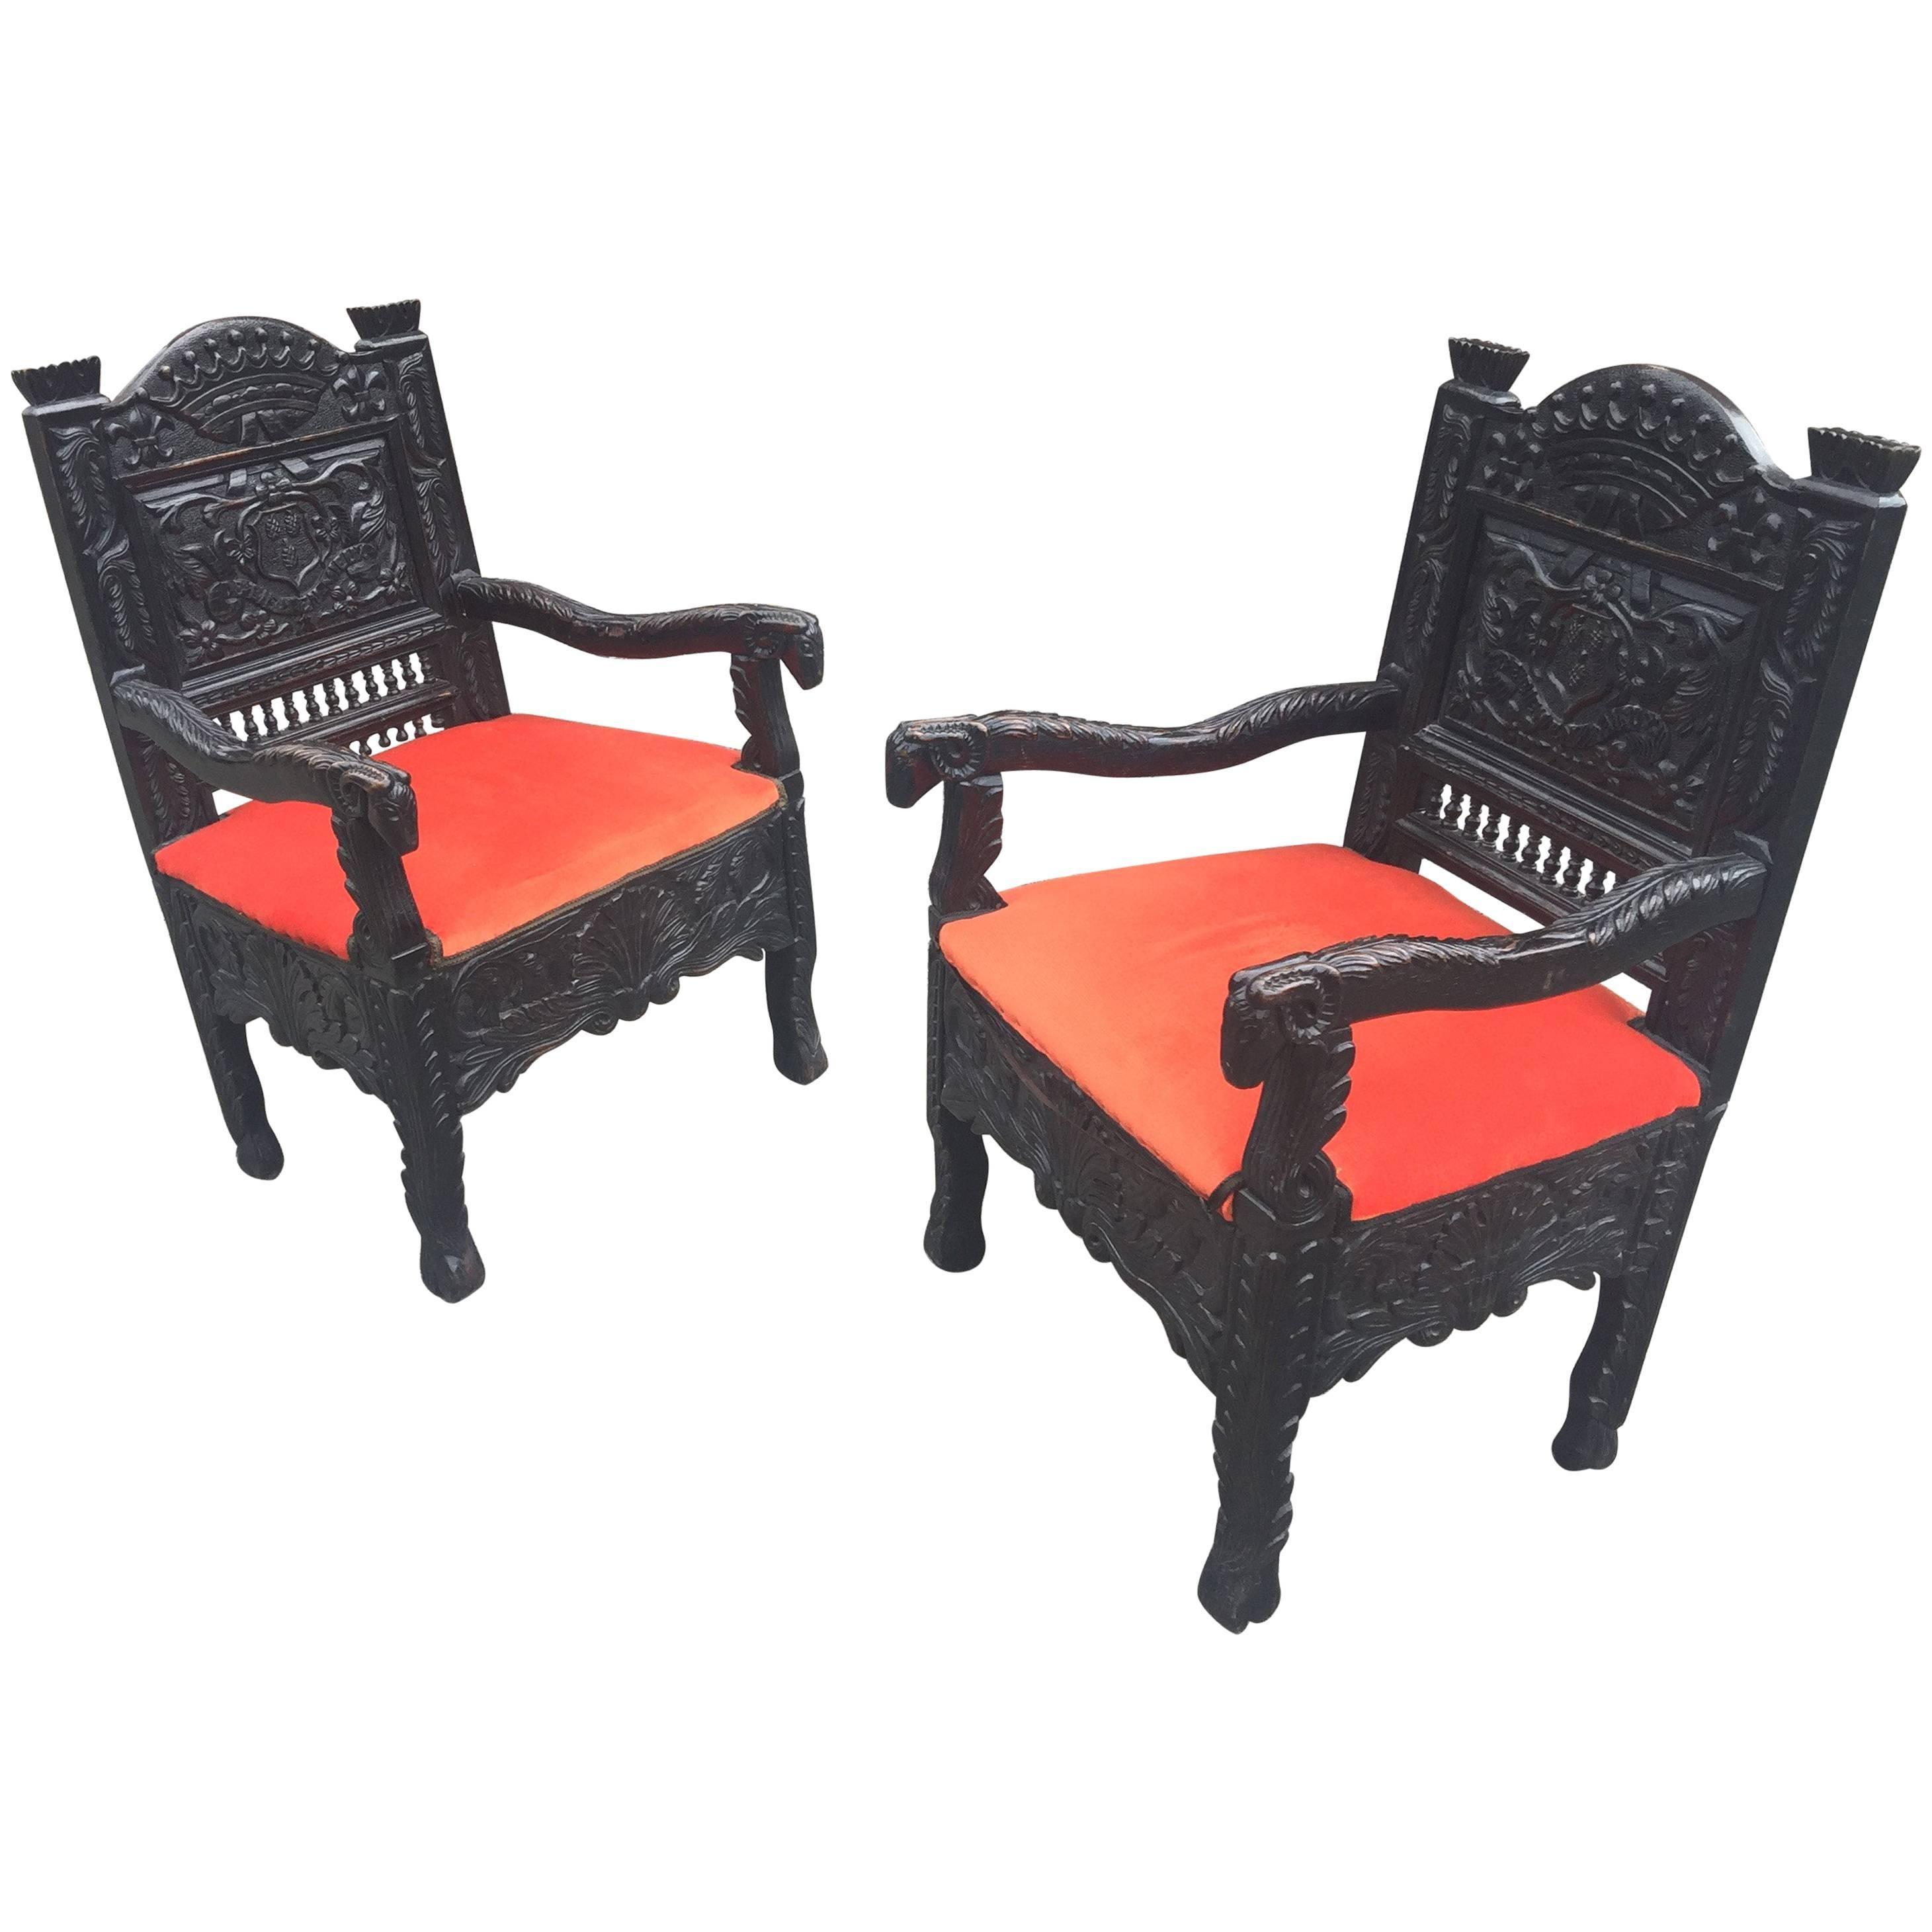 Pair of 19th Breton Chestnut Oak Armchairs with Head Ram Design